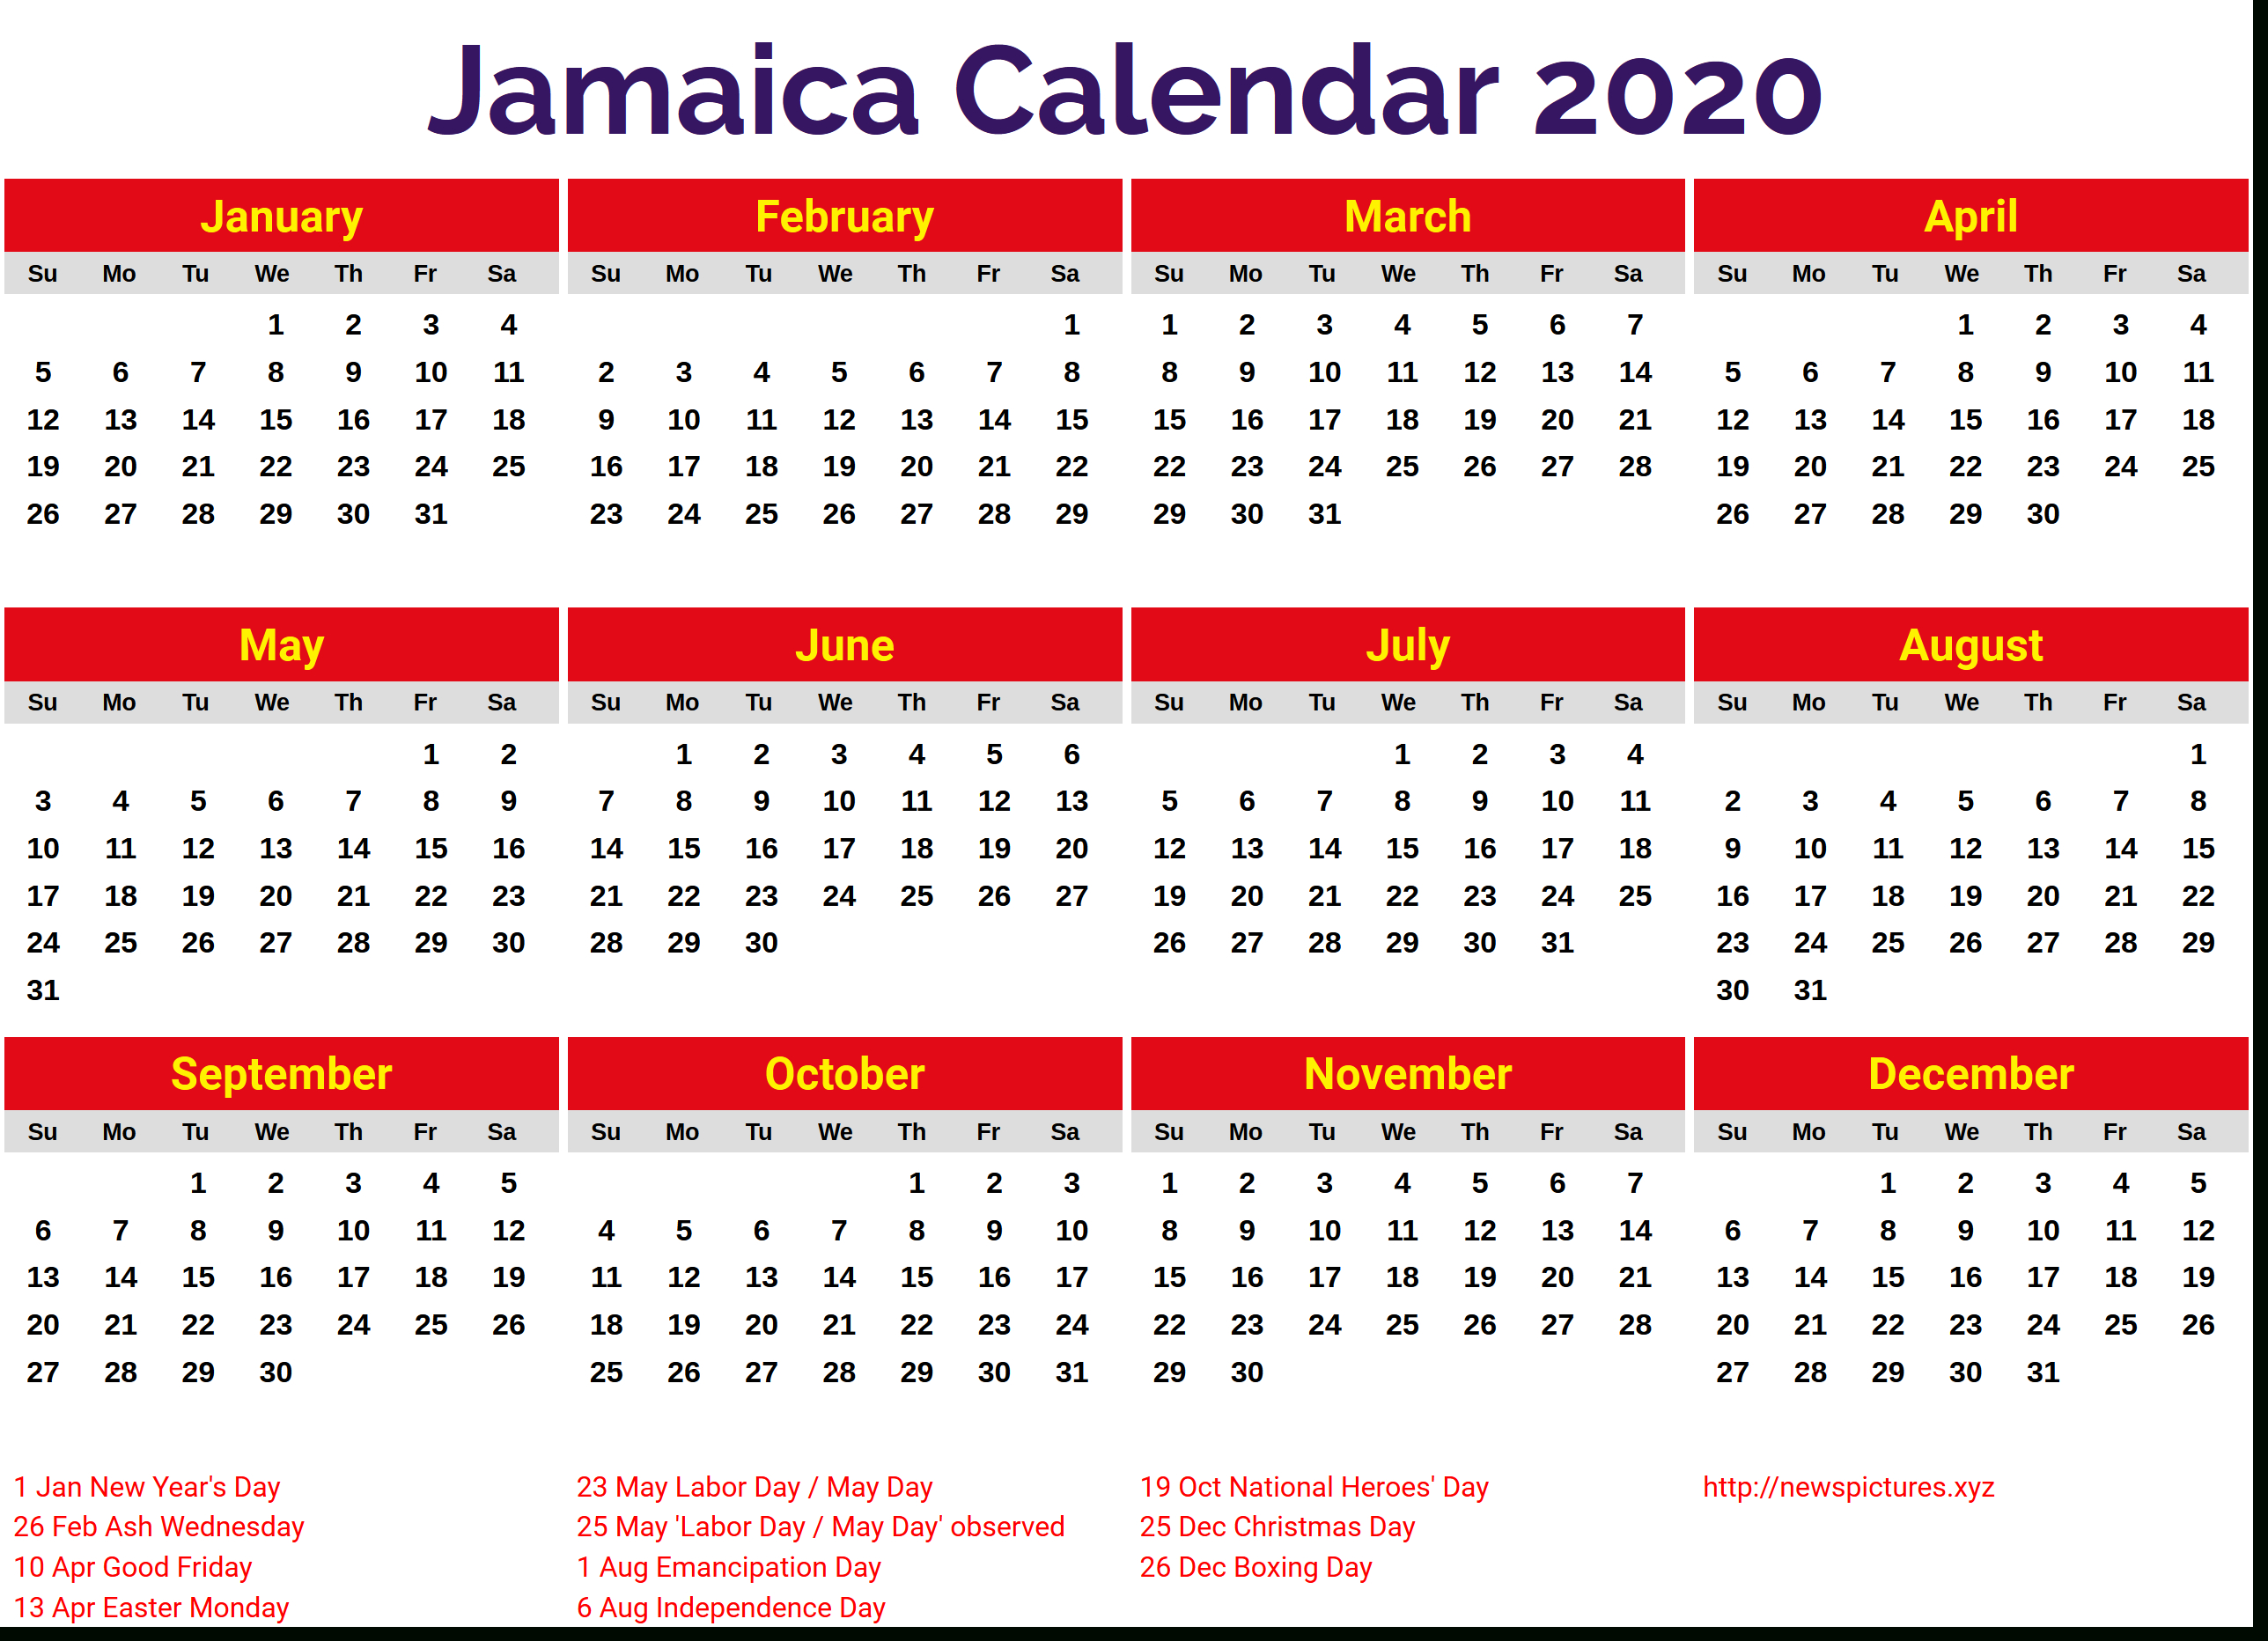 Image For Jamaica 2020 Calendar | August Calendar, 2019